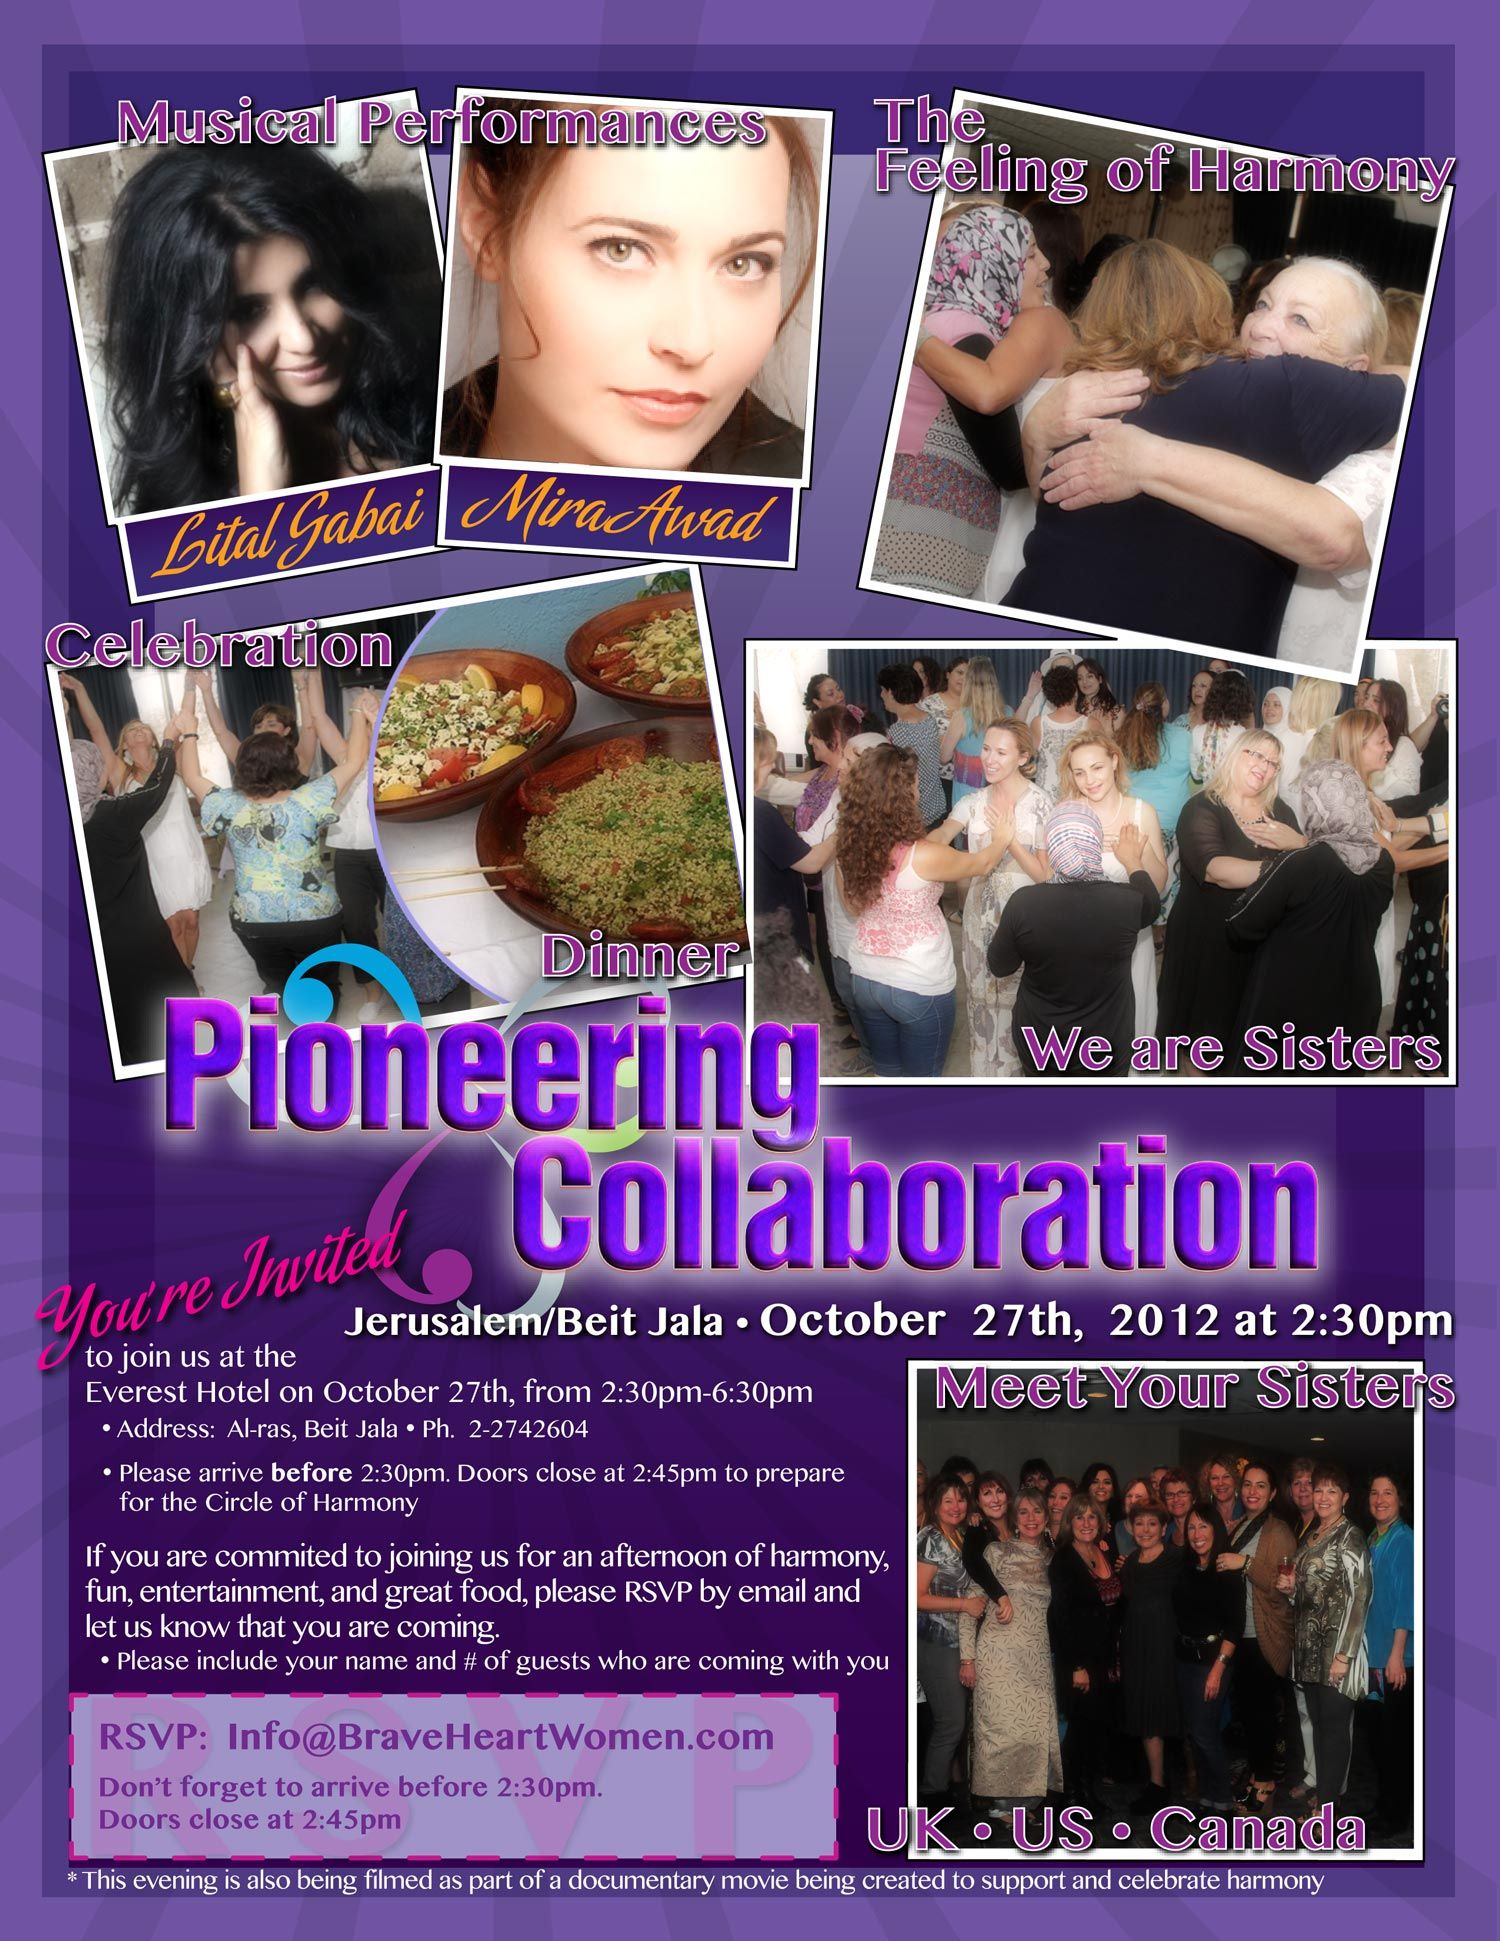 BRAVEHEART WOMEN!!! Supportive, Collaboration, Jala